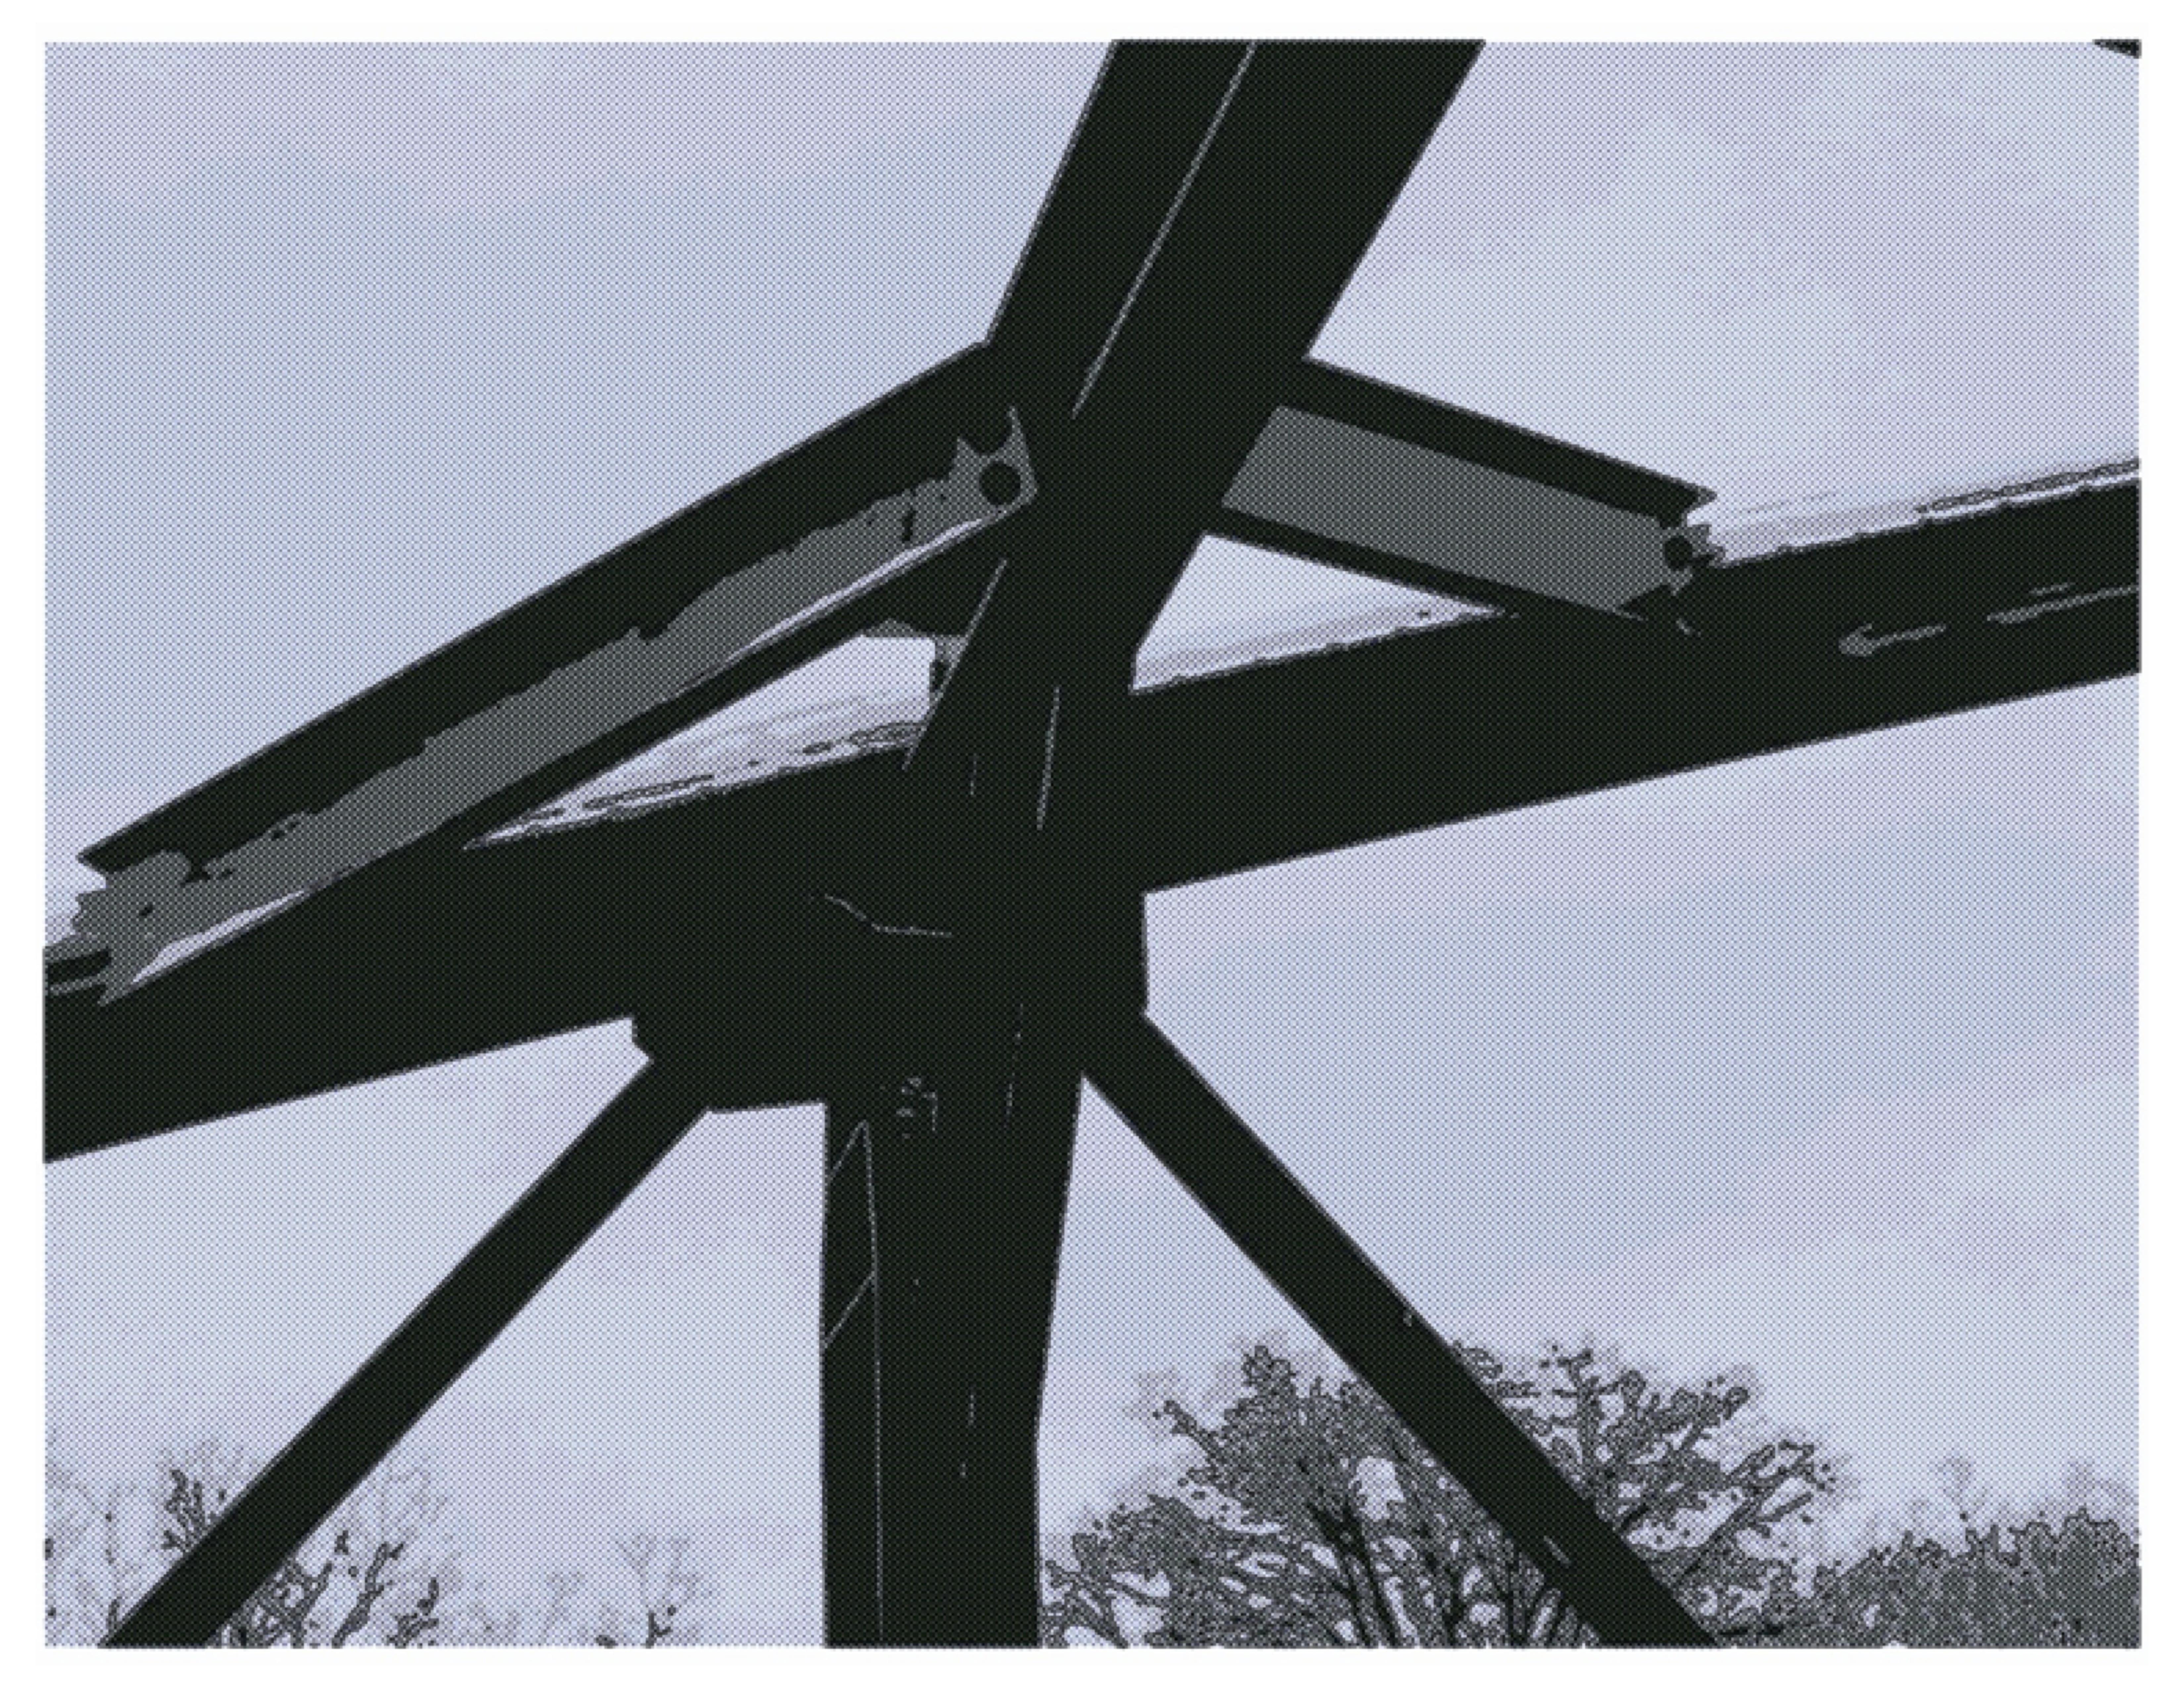 Bridge study 5, computer altered image, Dec 30, 2018